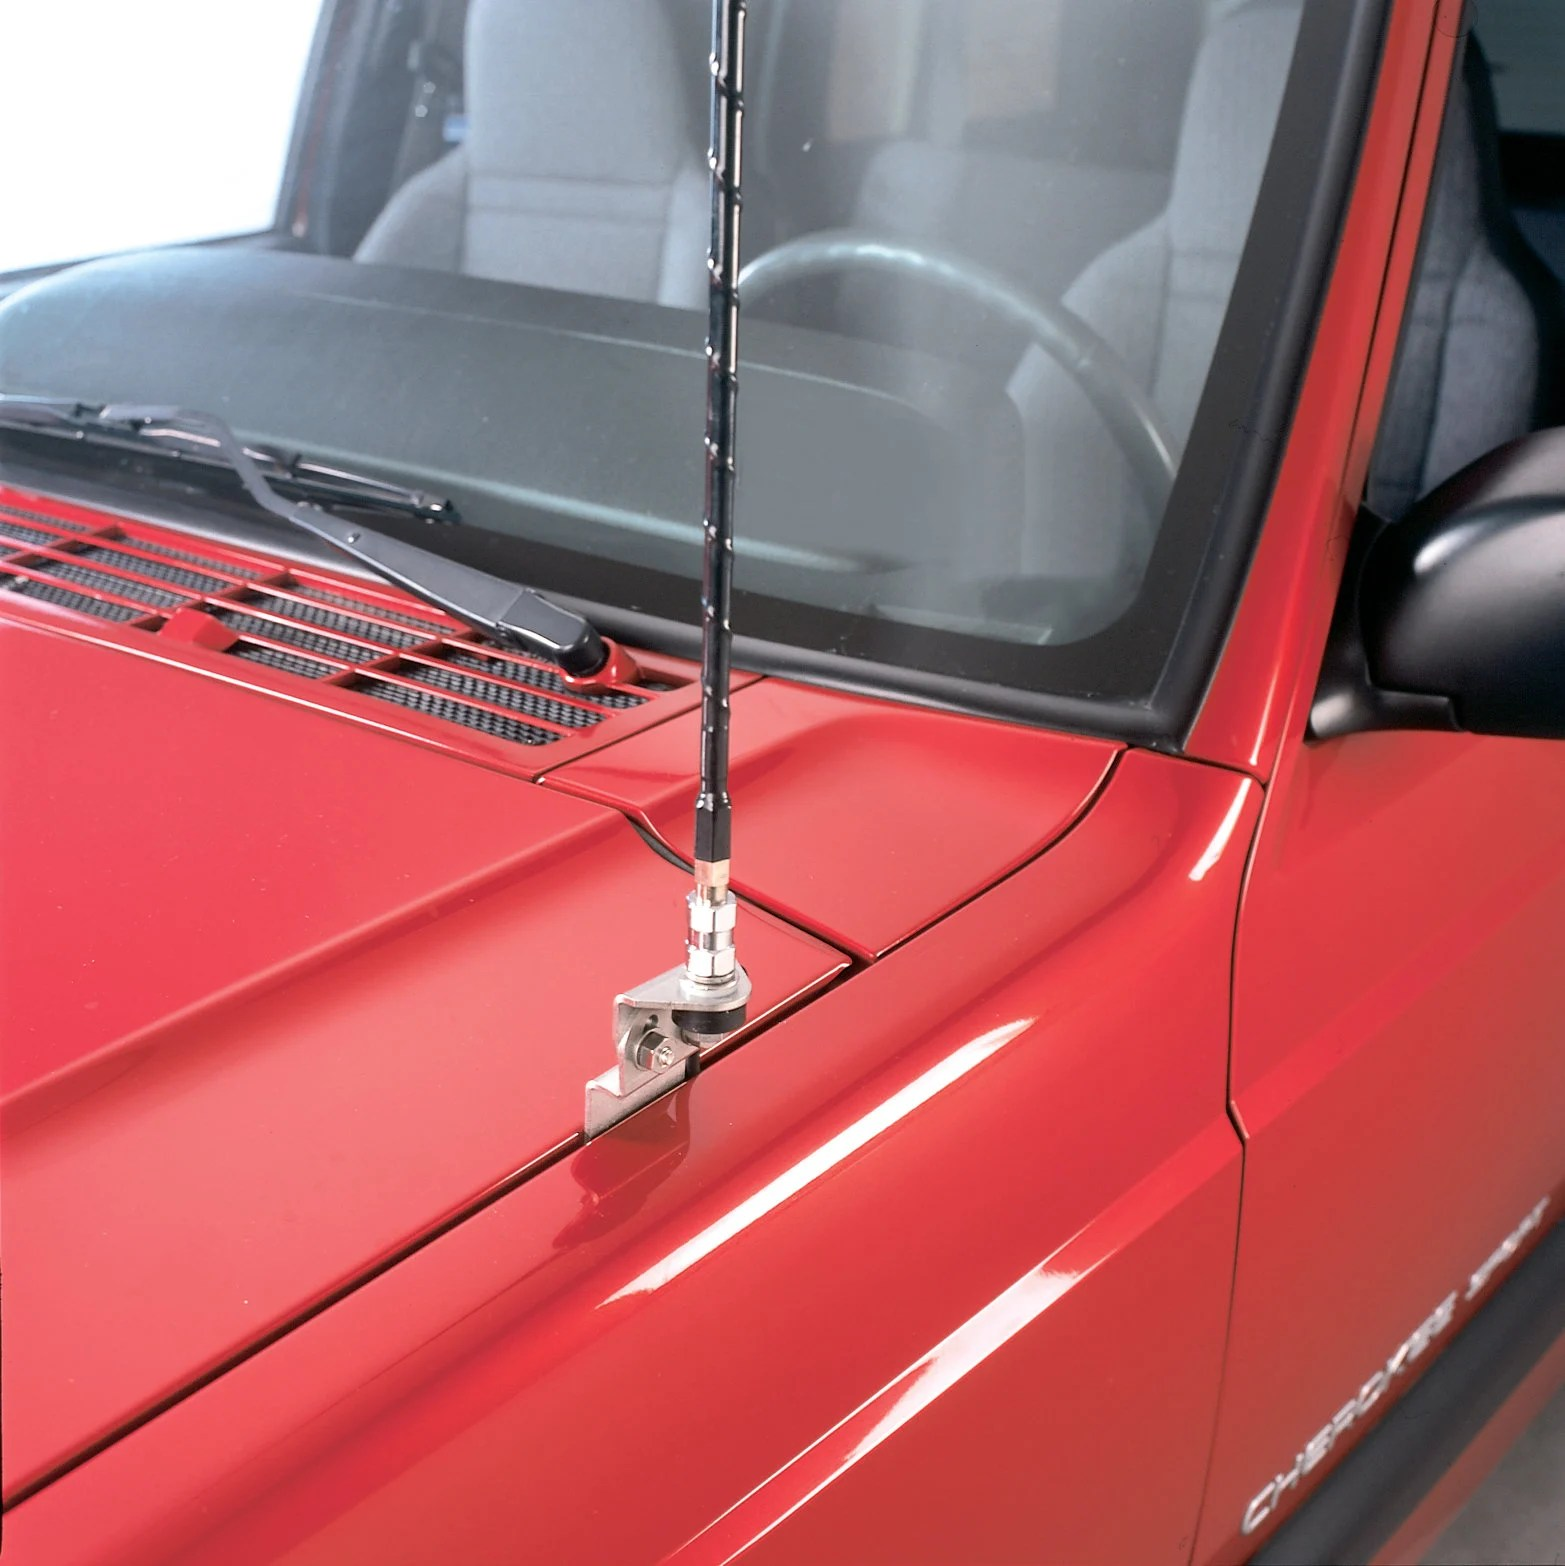 hight resolution of quadratec cb antenna mount cable kit for 84 04 jeep cherokee xj grand cherokee zj wj quadratec